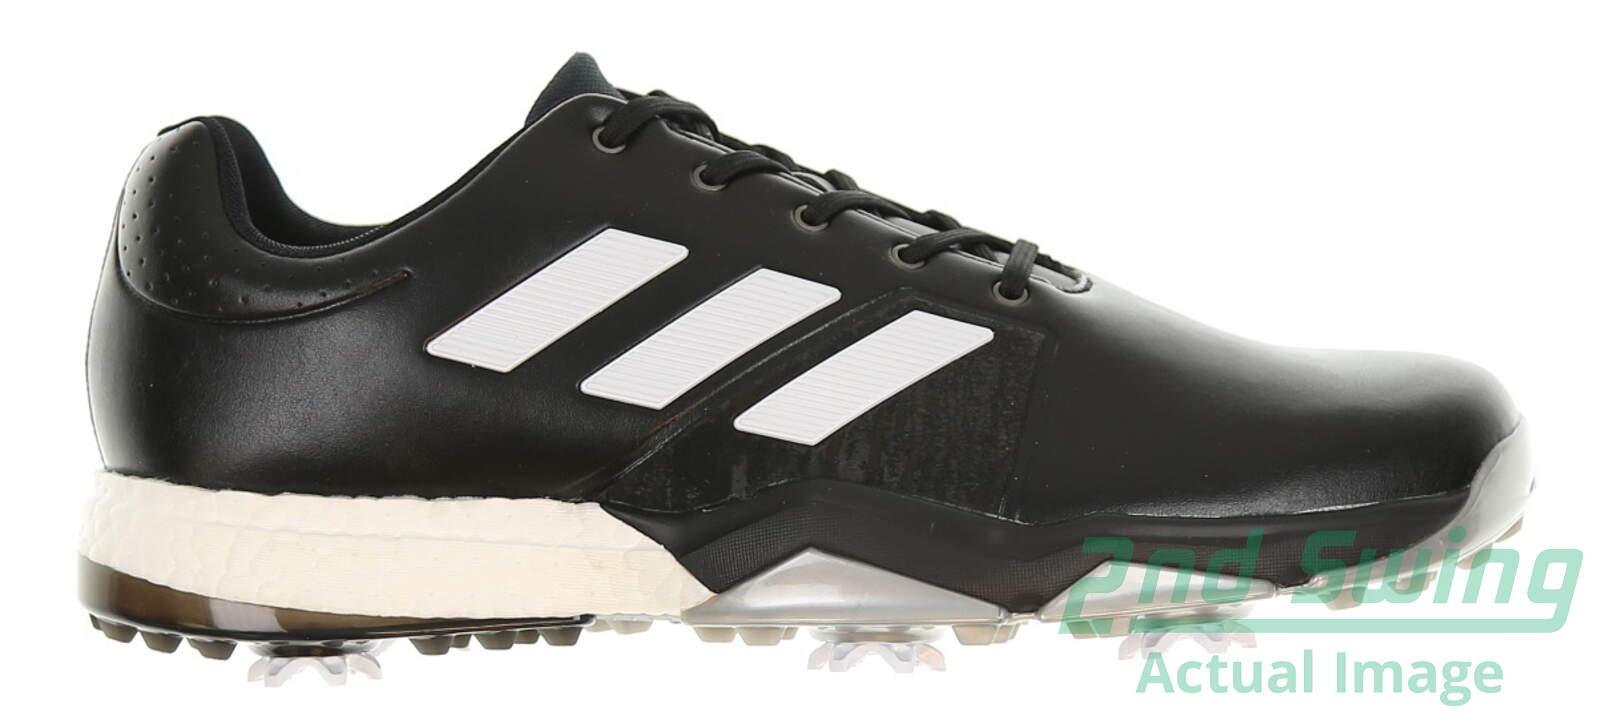 New hombre  Golf zapatos Adidas Adipower Boost 3 Medium negro / White